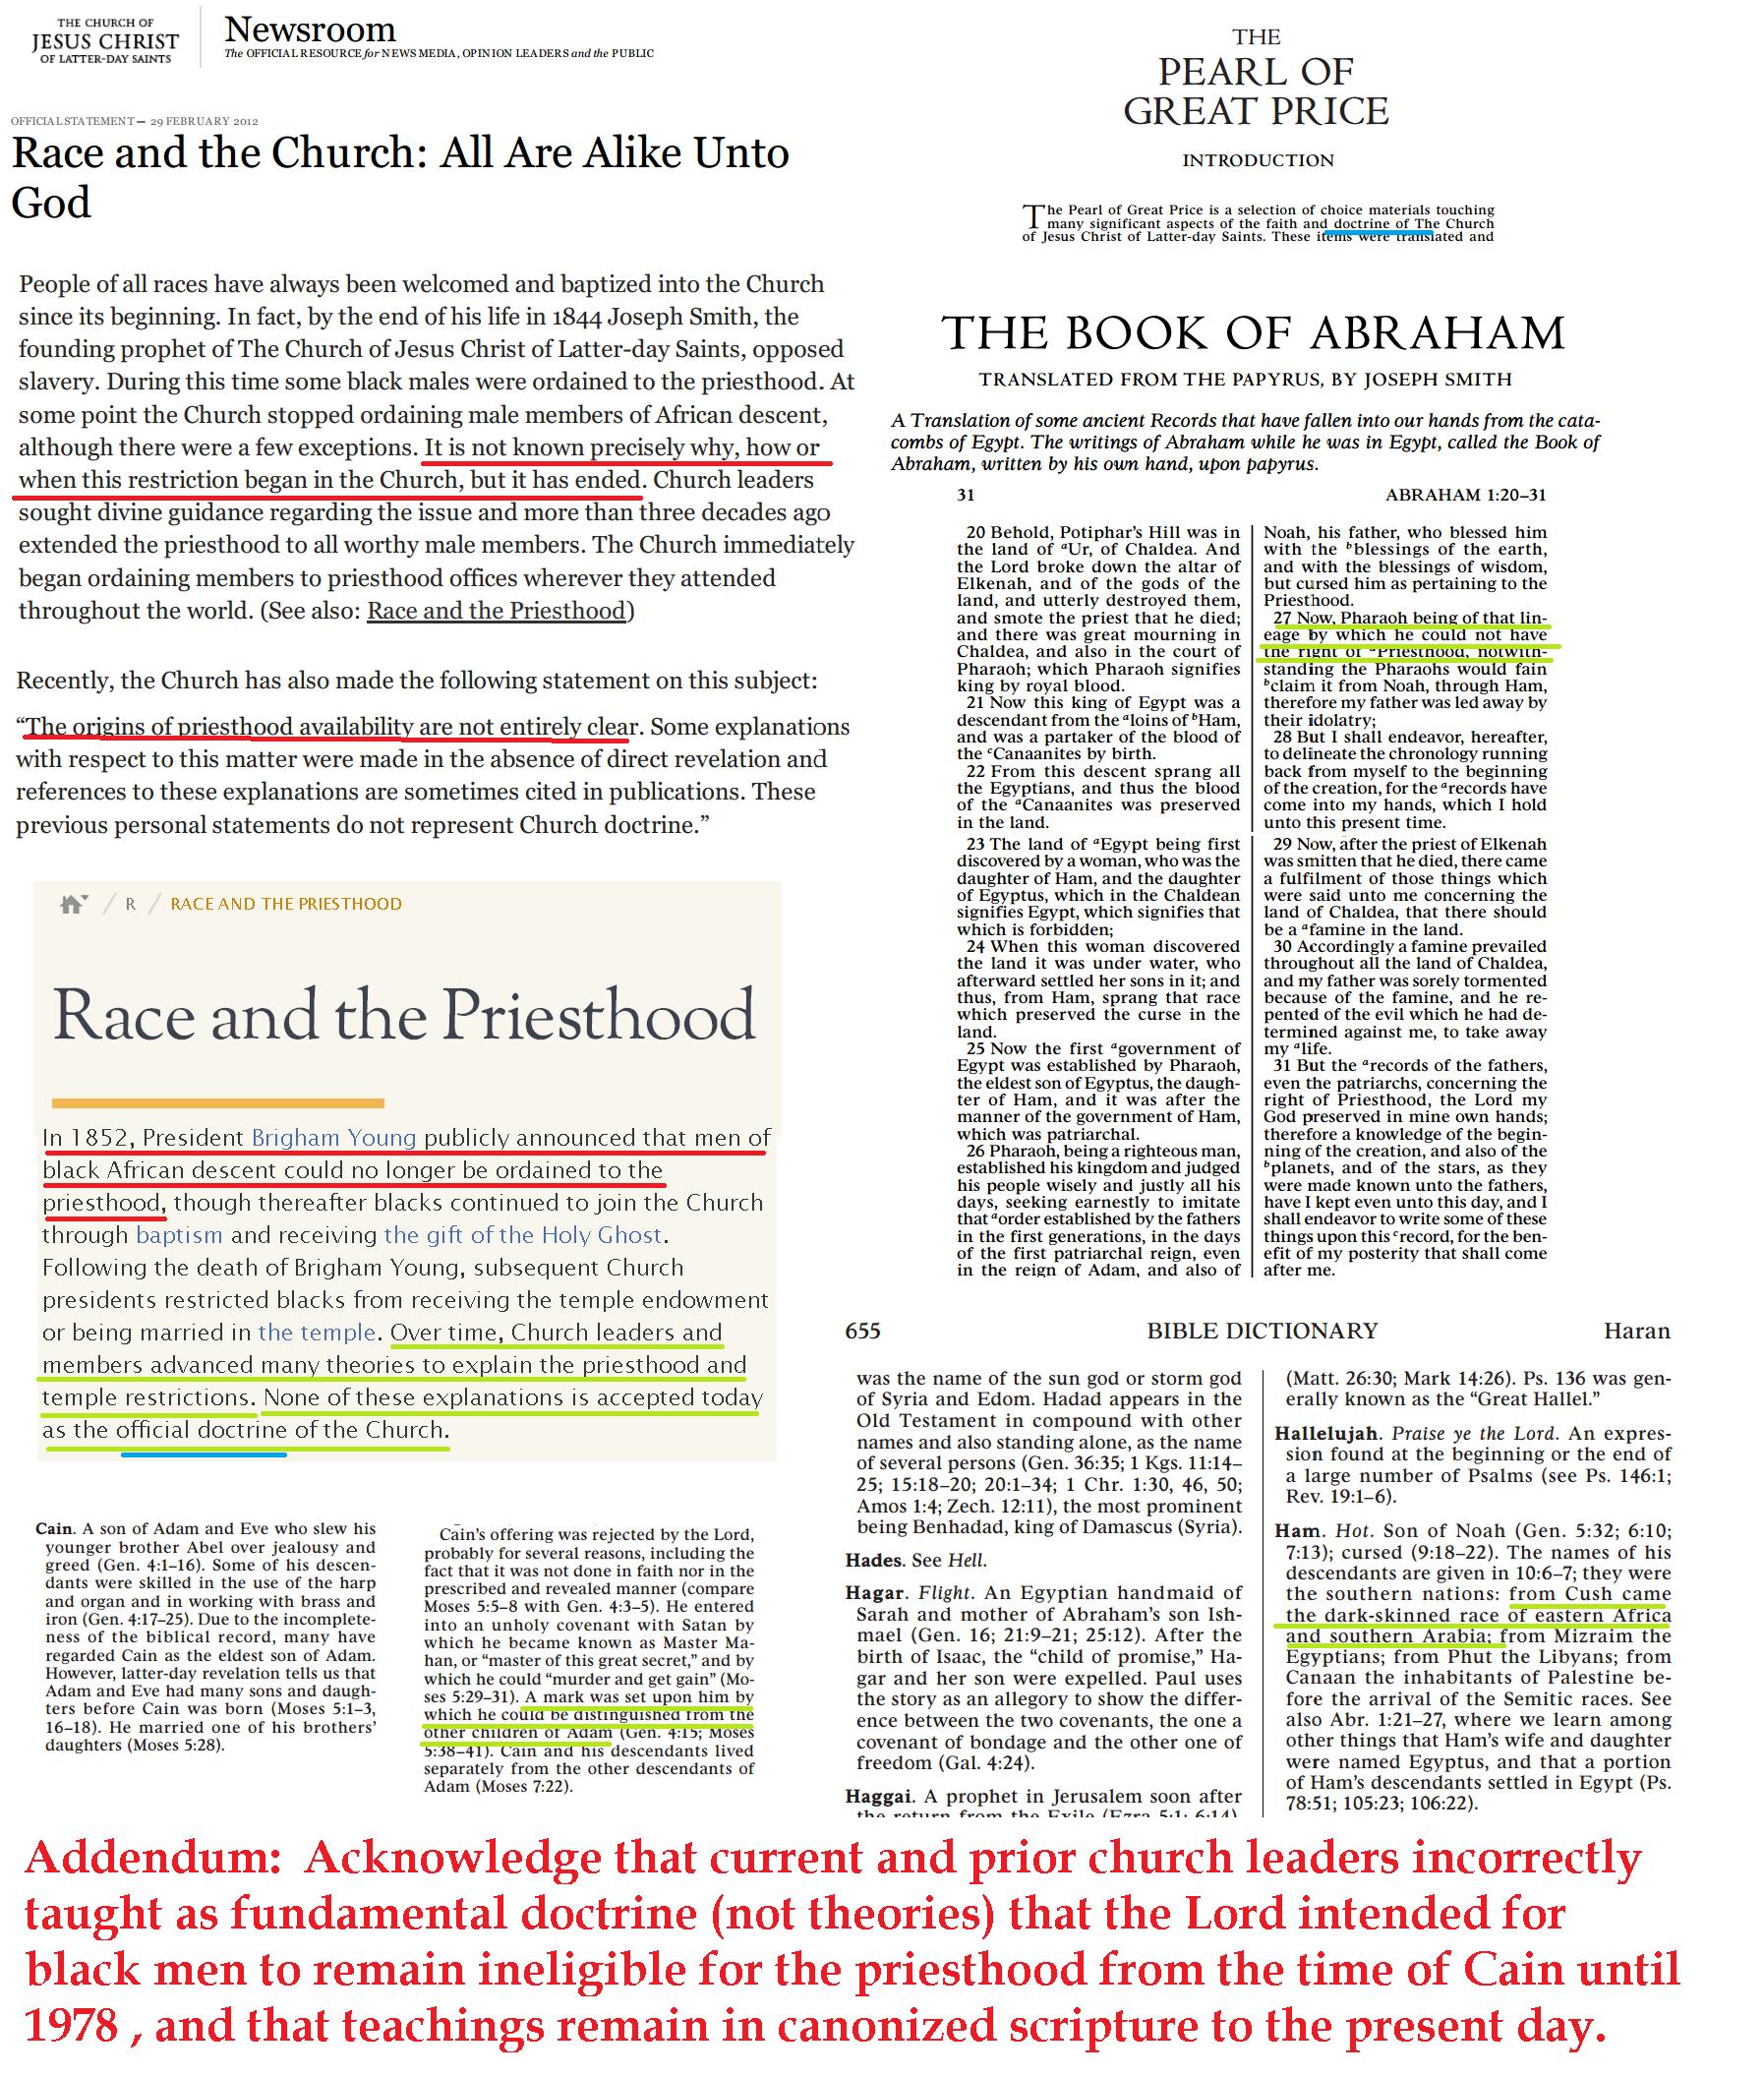 021 Essay Example Black And Priesthood Gospel Topics Outstanding Essays Book Of Abraham Pdf Mormon Translation Full